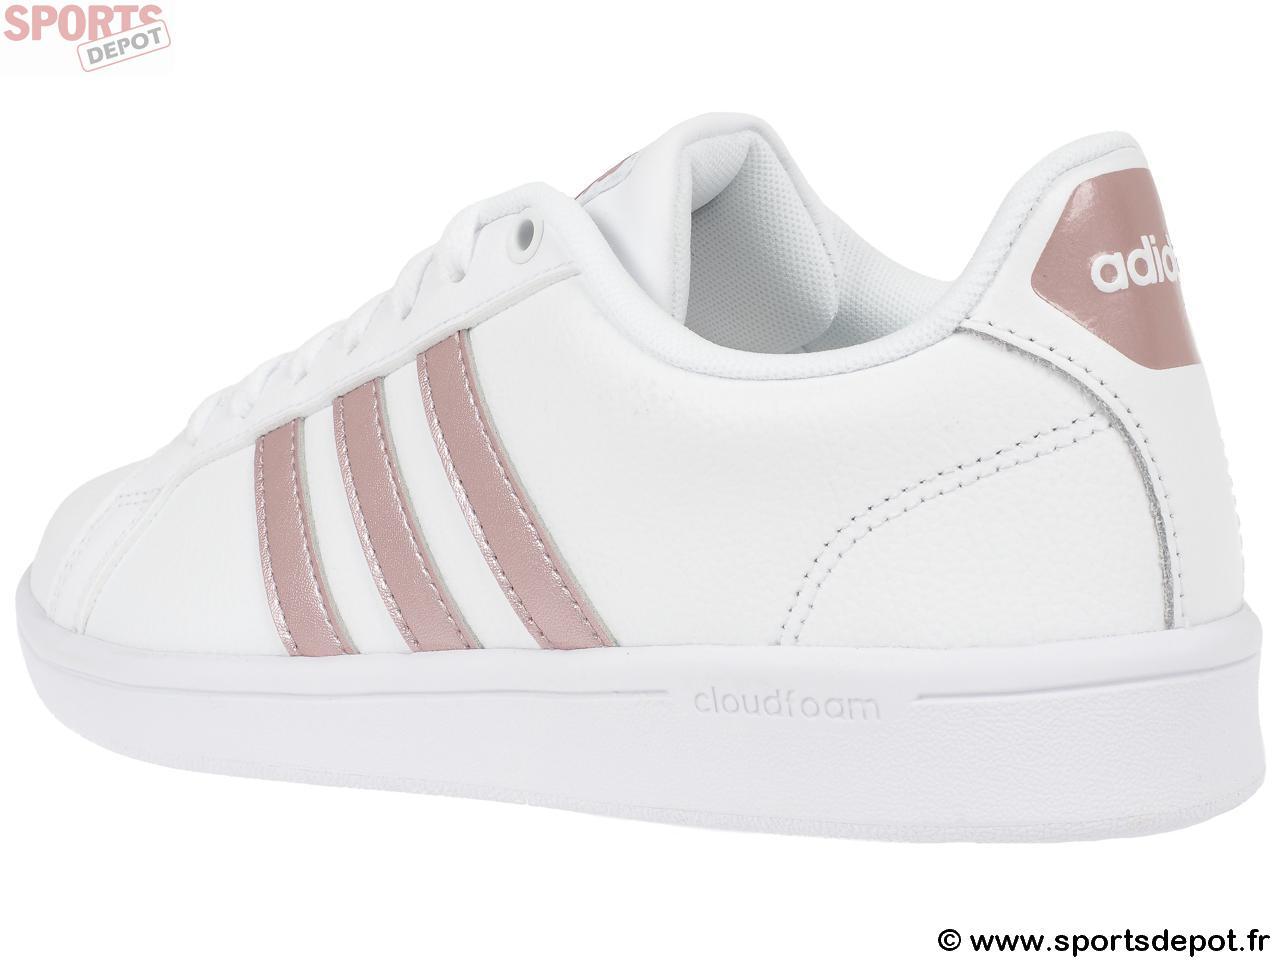 Mode Ville Advantage Acheter W Ftwwht Chaussures Adidas Cf Femme W29EDHI